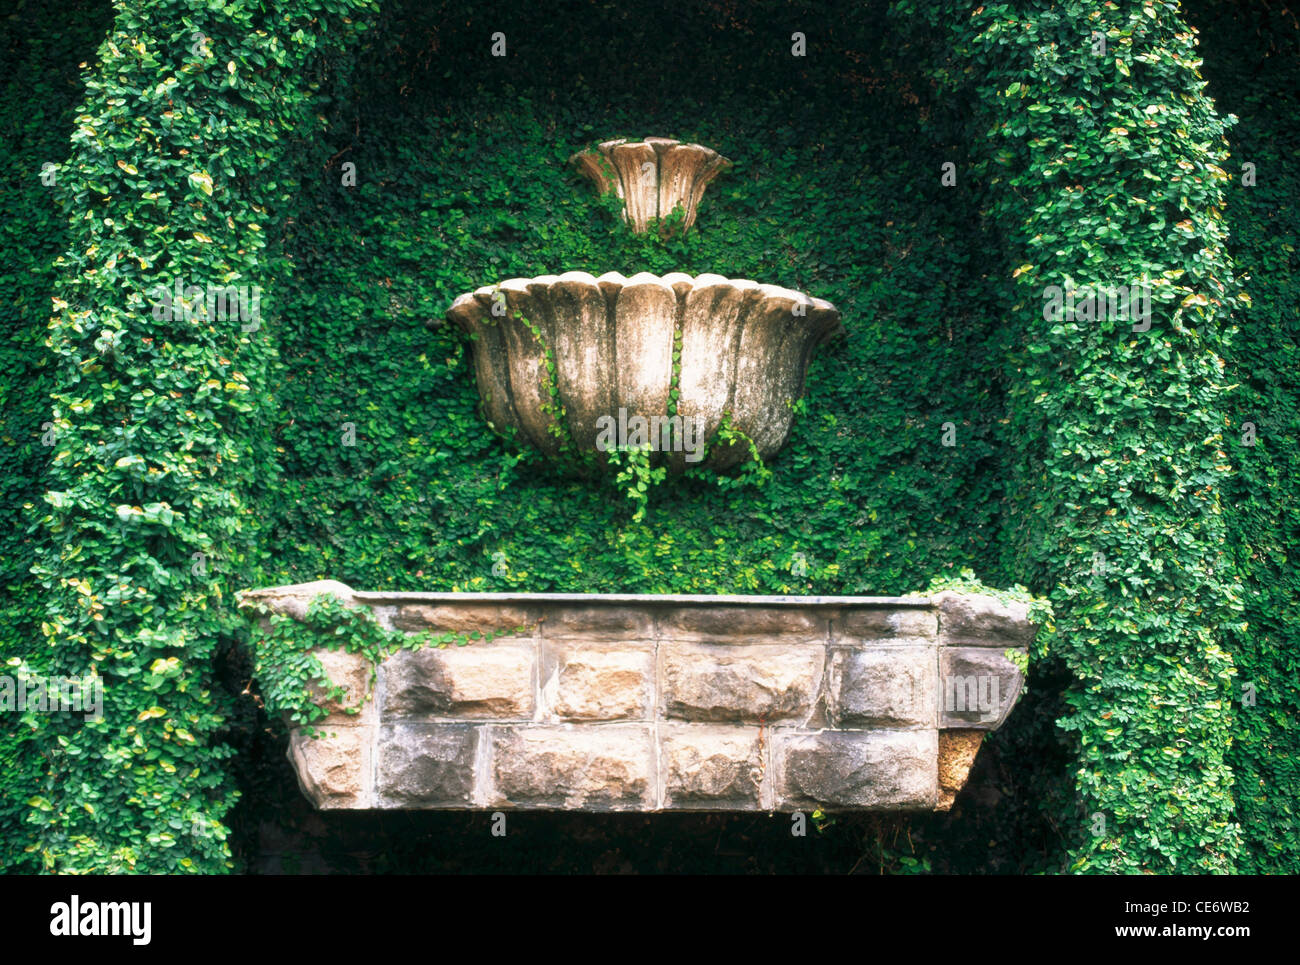 Pietra Verde Rivestimento : Nmk 86045 : verde liane rivestimento parete in pietra fontana al